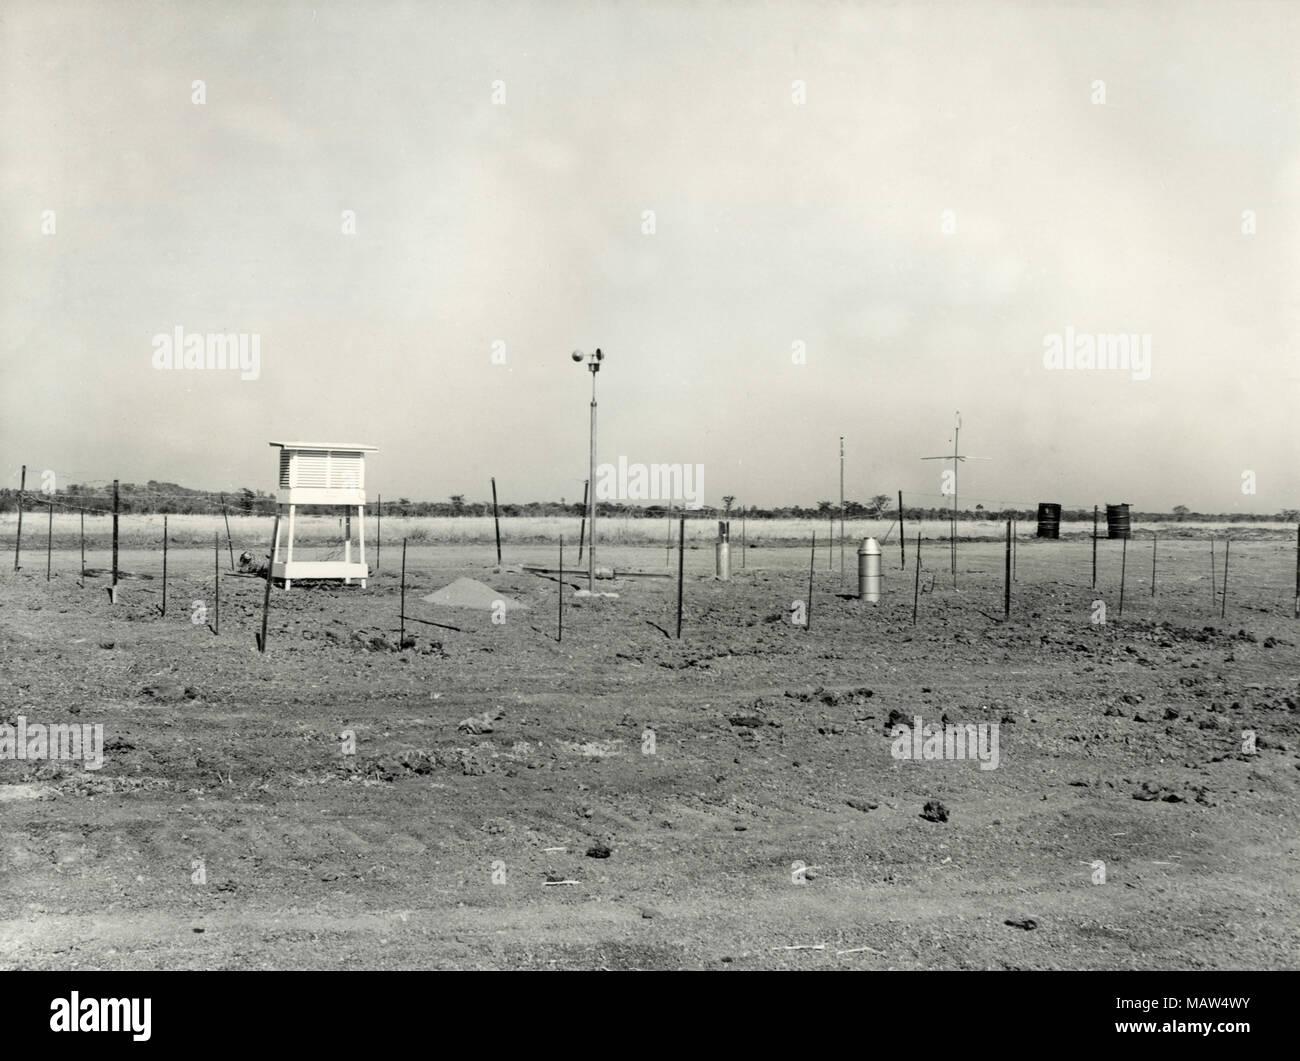 Meteorological station, Rhodesian Selection Trust, Kafue Pilot Polder, Zambia, South Rhodesia 1957 - Stock Image